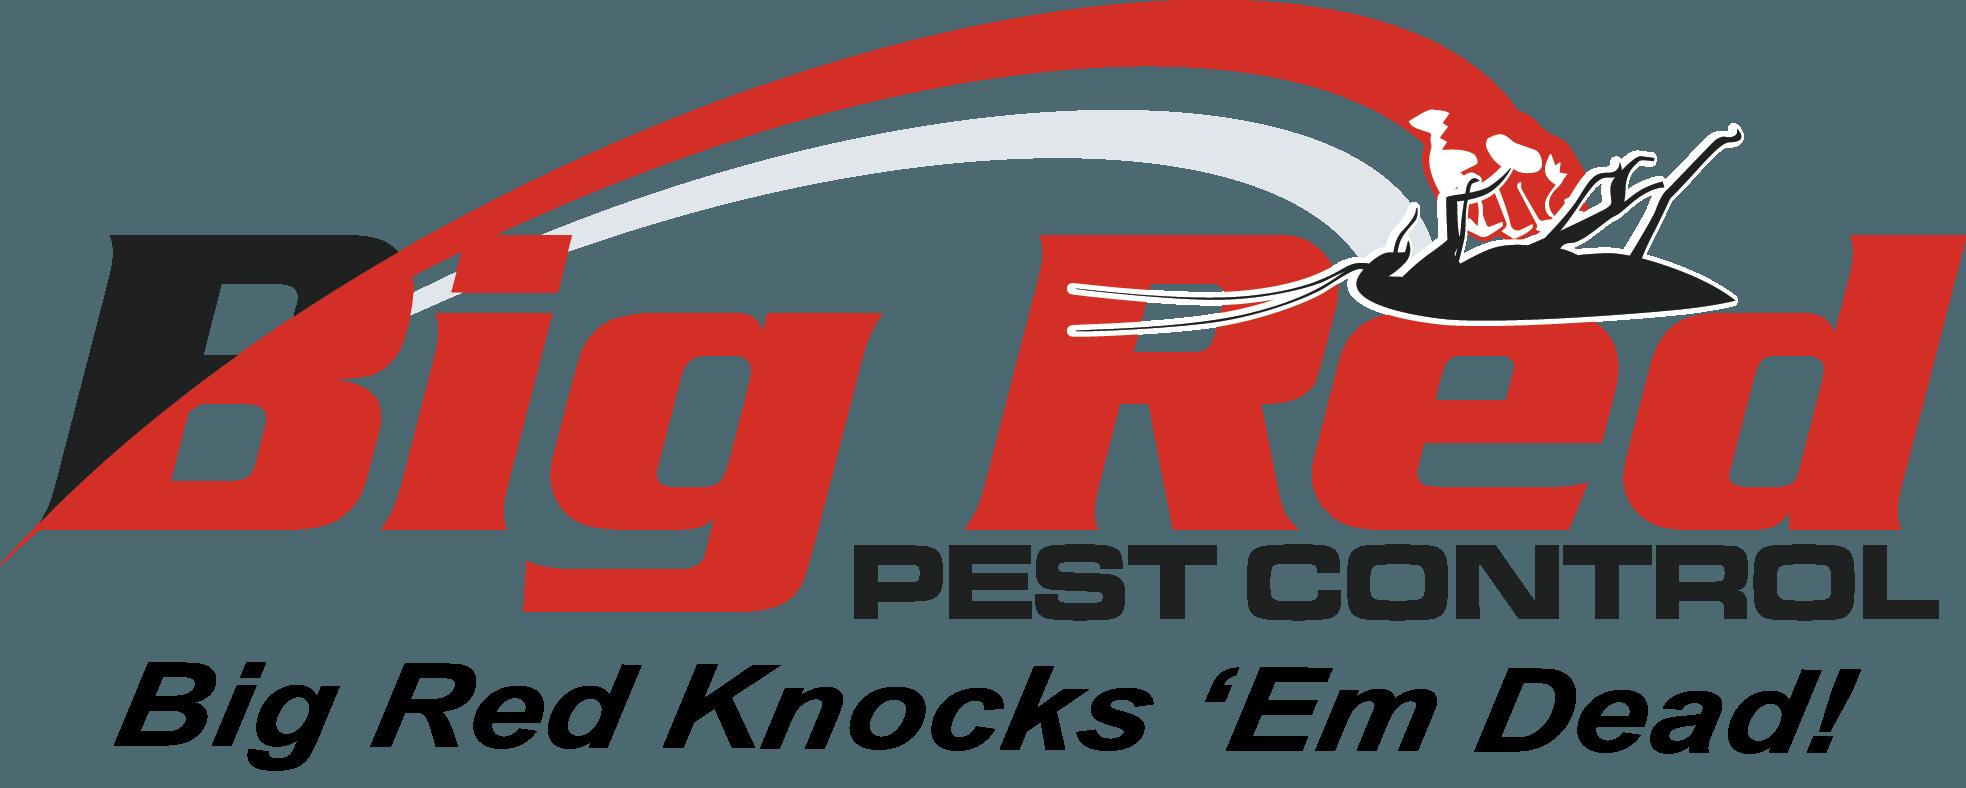 B R Pest Control Image